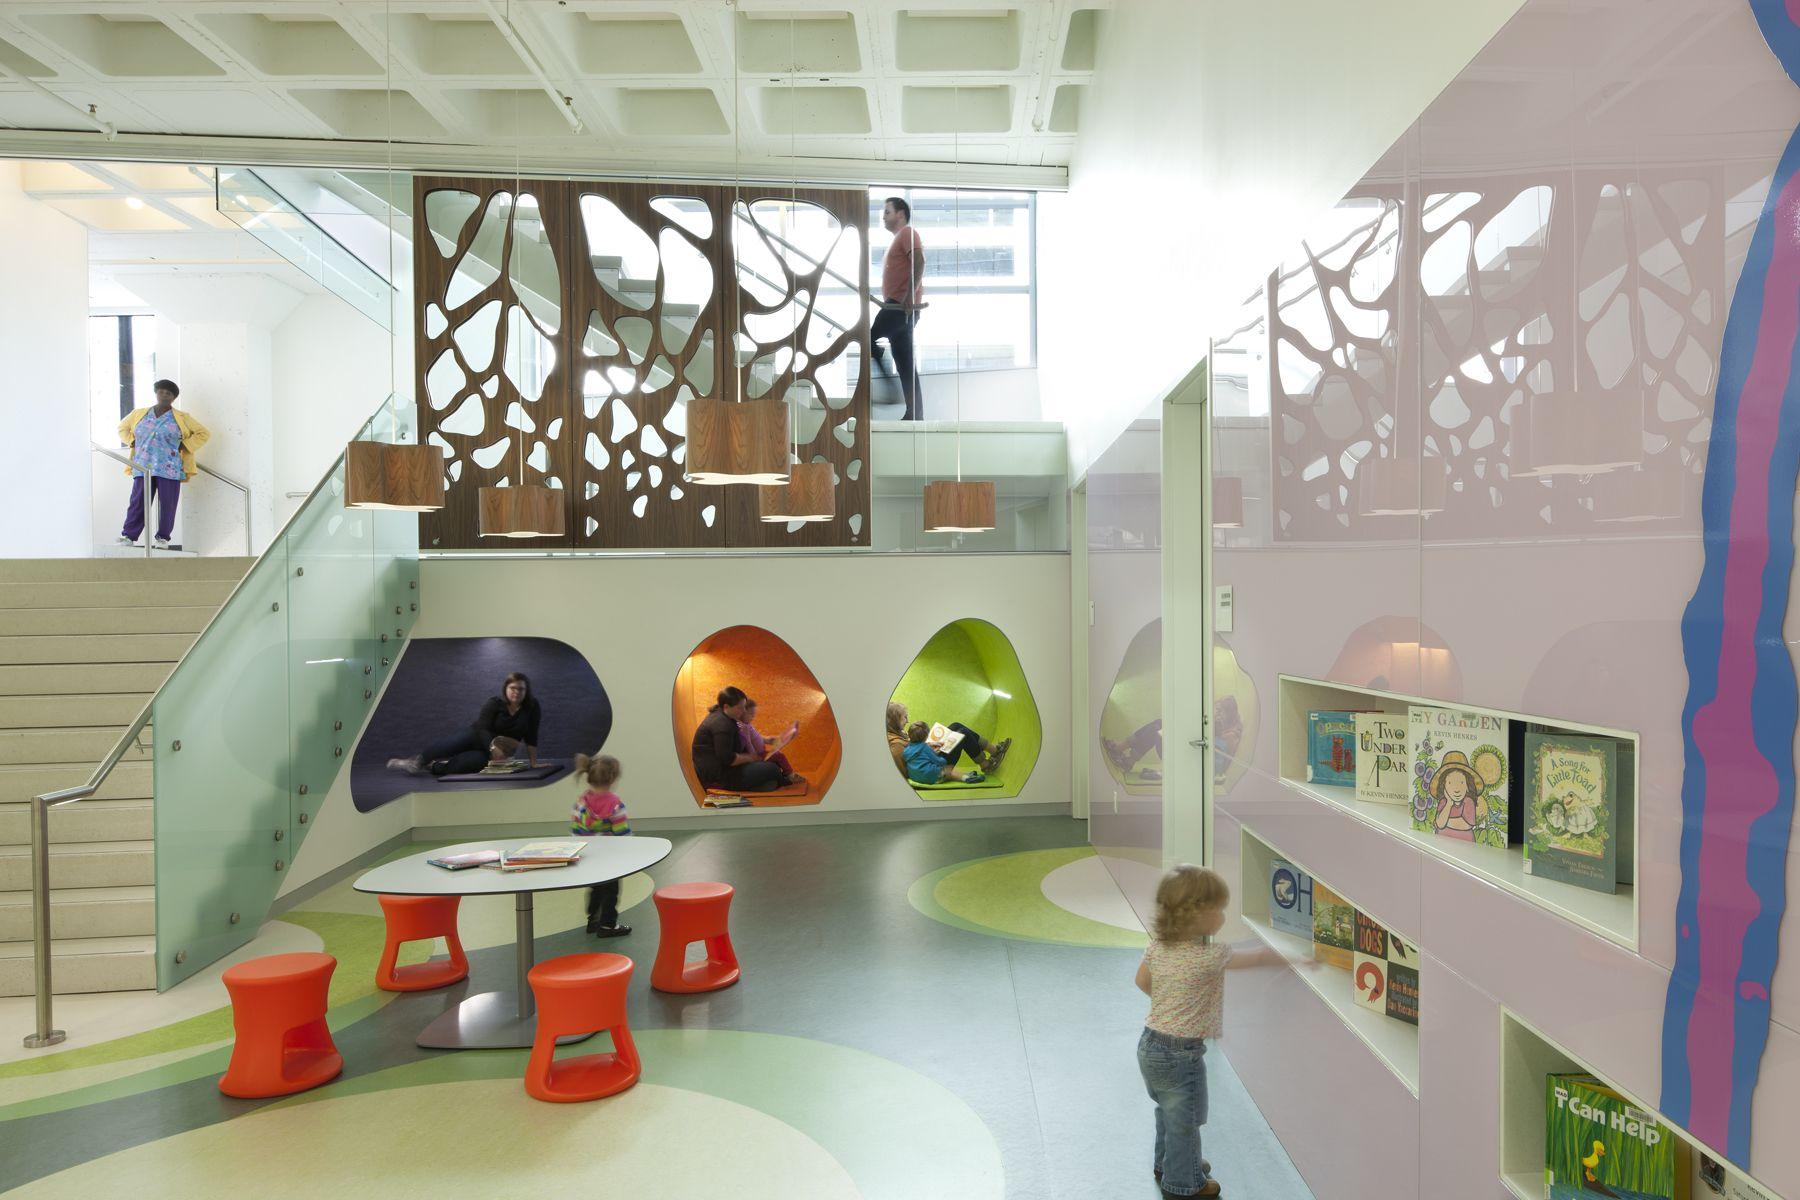 Martin Work At Madison Public Library Is A Big Winner 2014 Starnet Design Awards